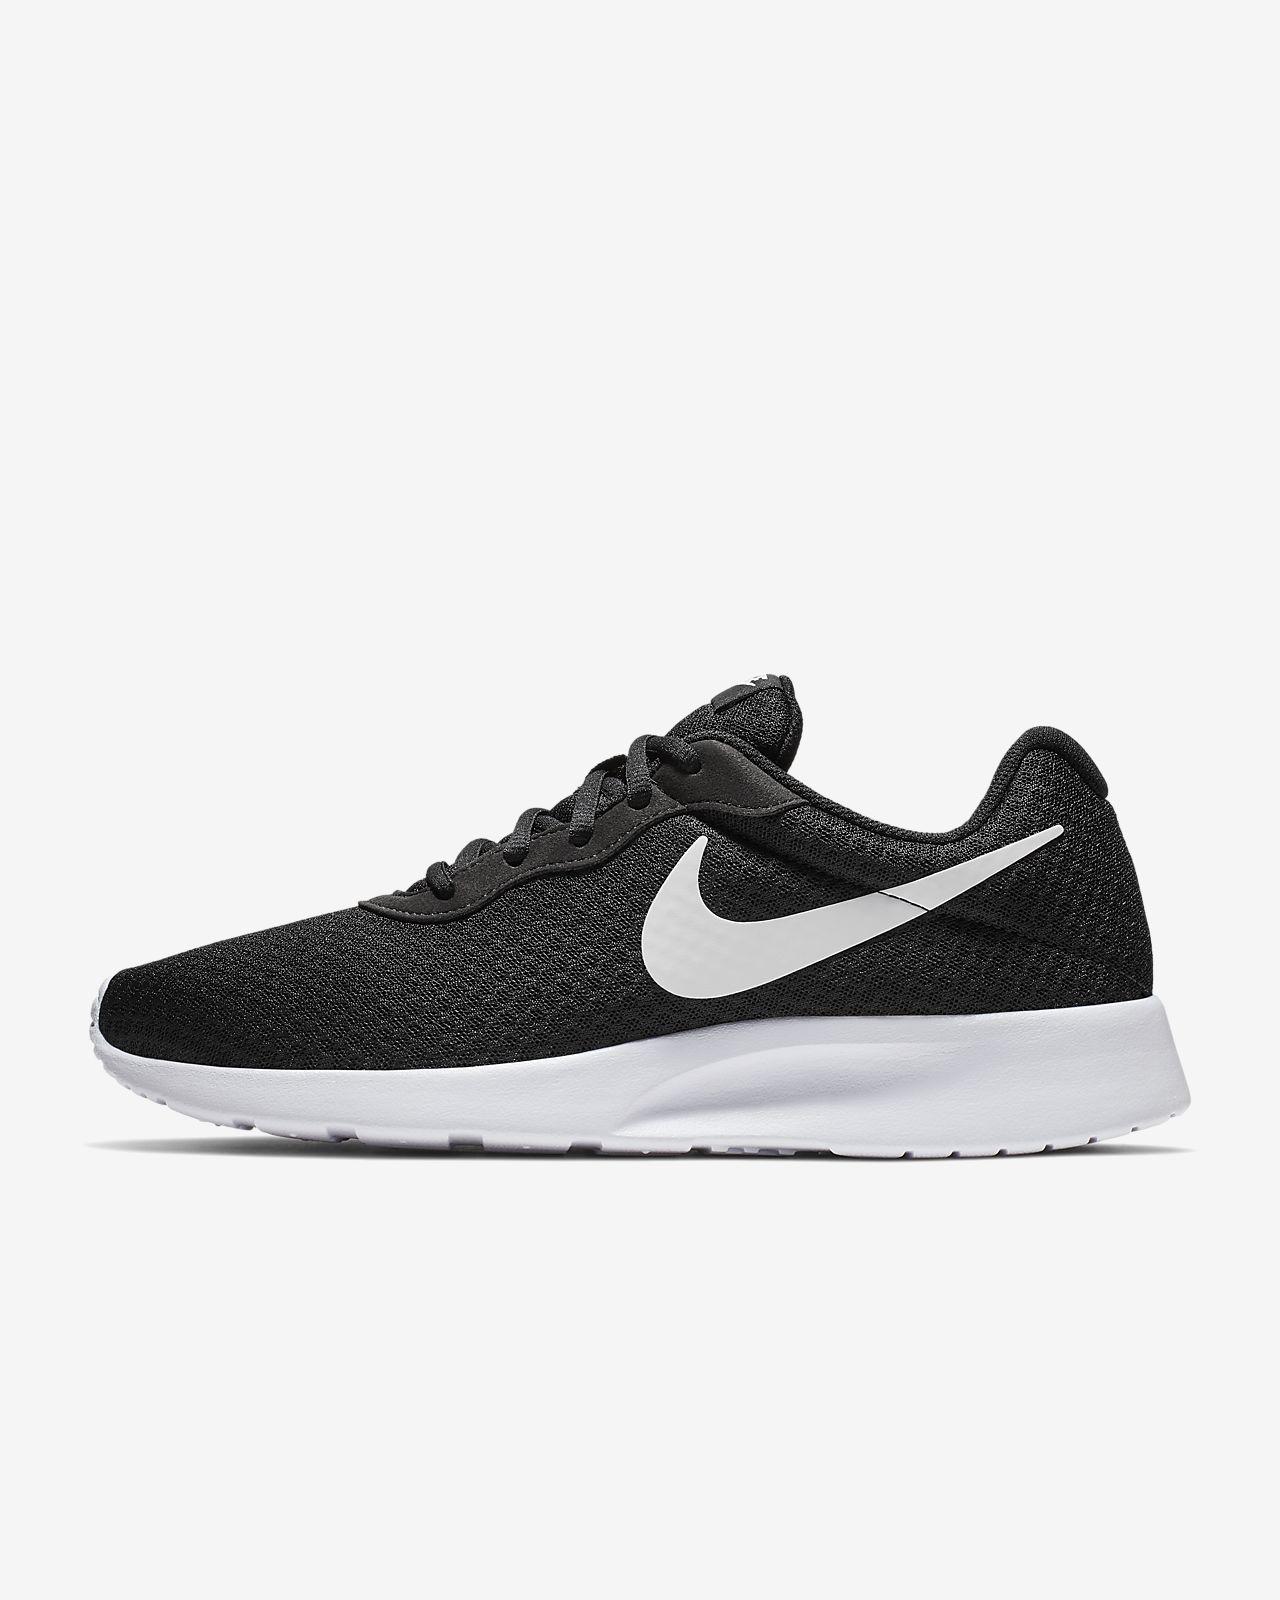 premium selection c0768 77937 ... Scarpa Nike Tanjun - Uomo